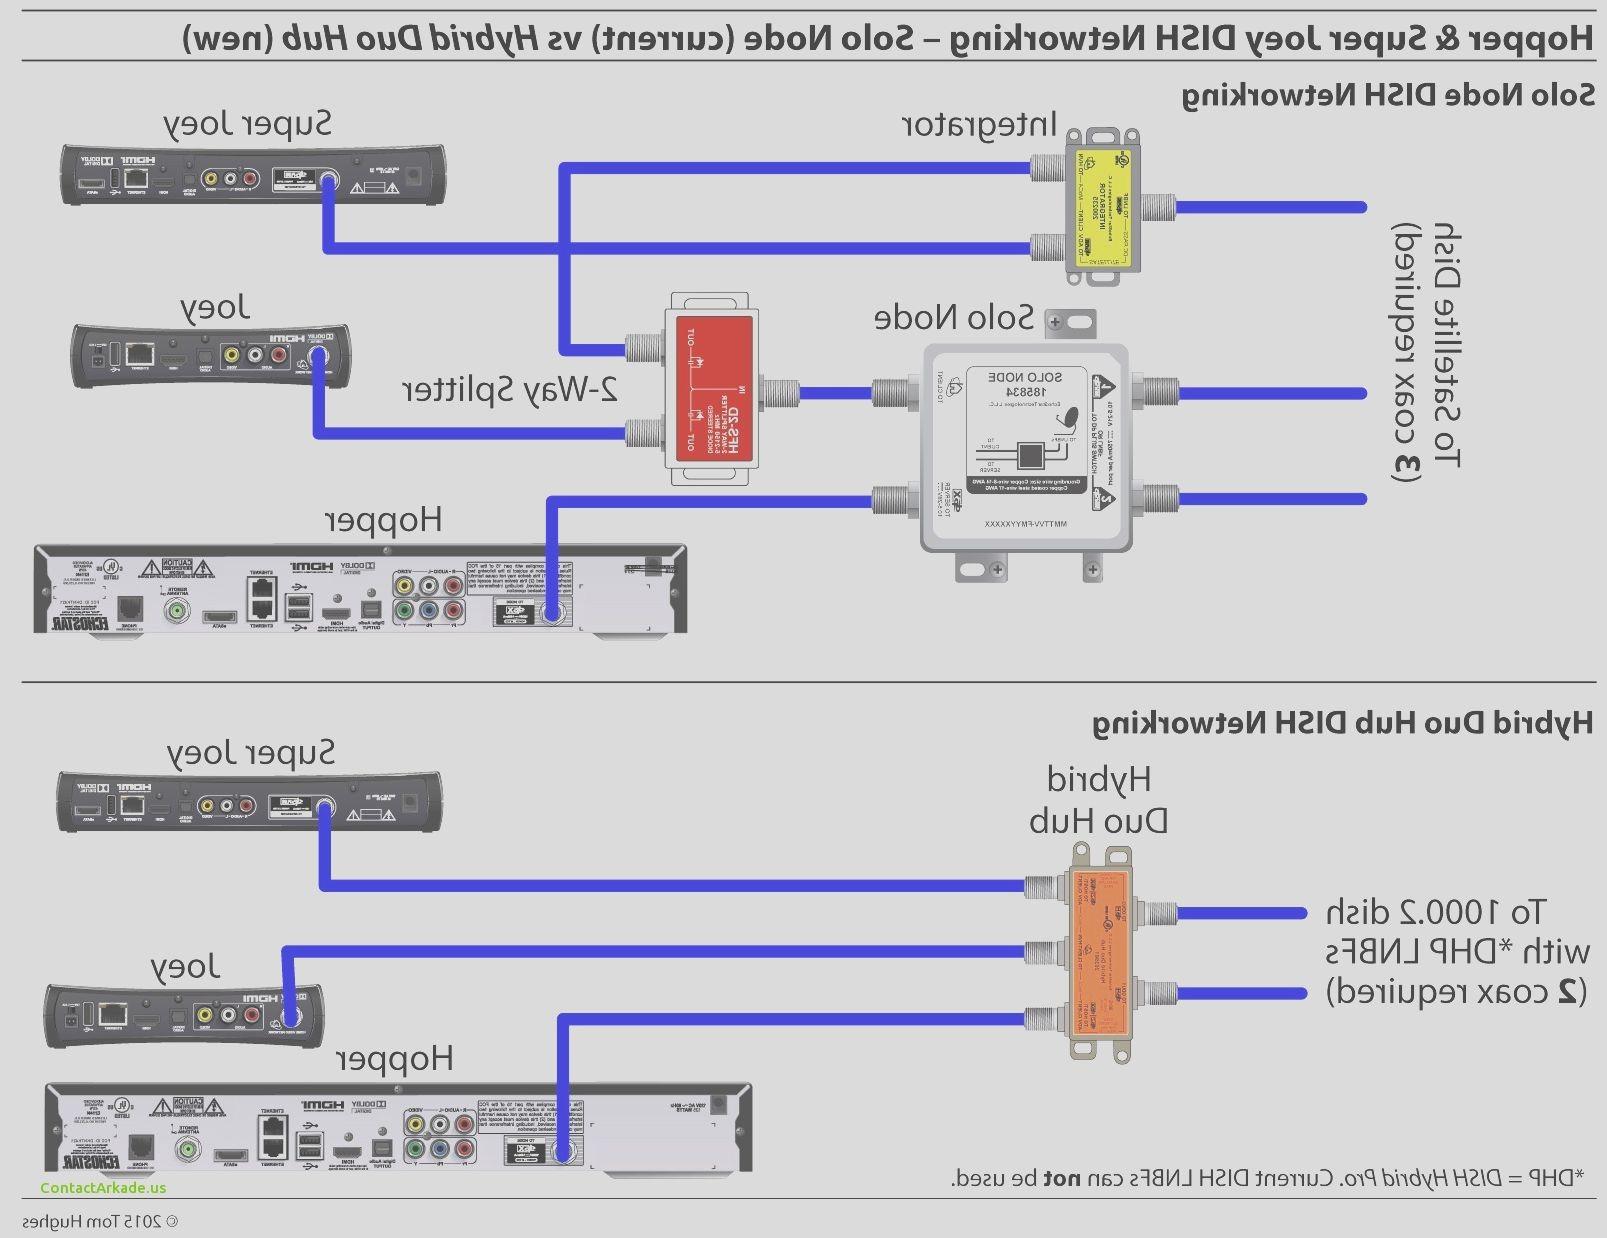 Satellite Dish Wiring Diagram Network Alpine Related Post